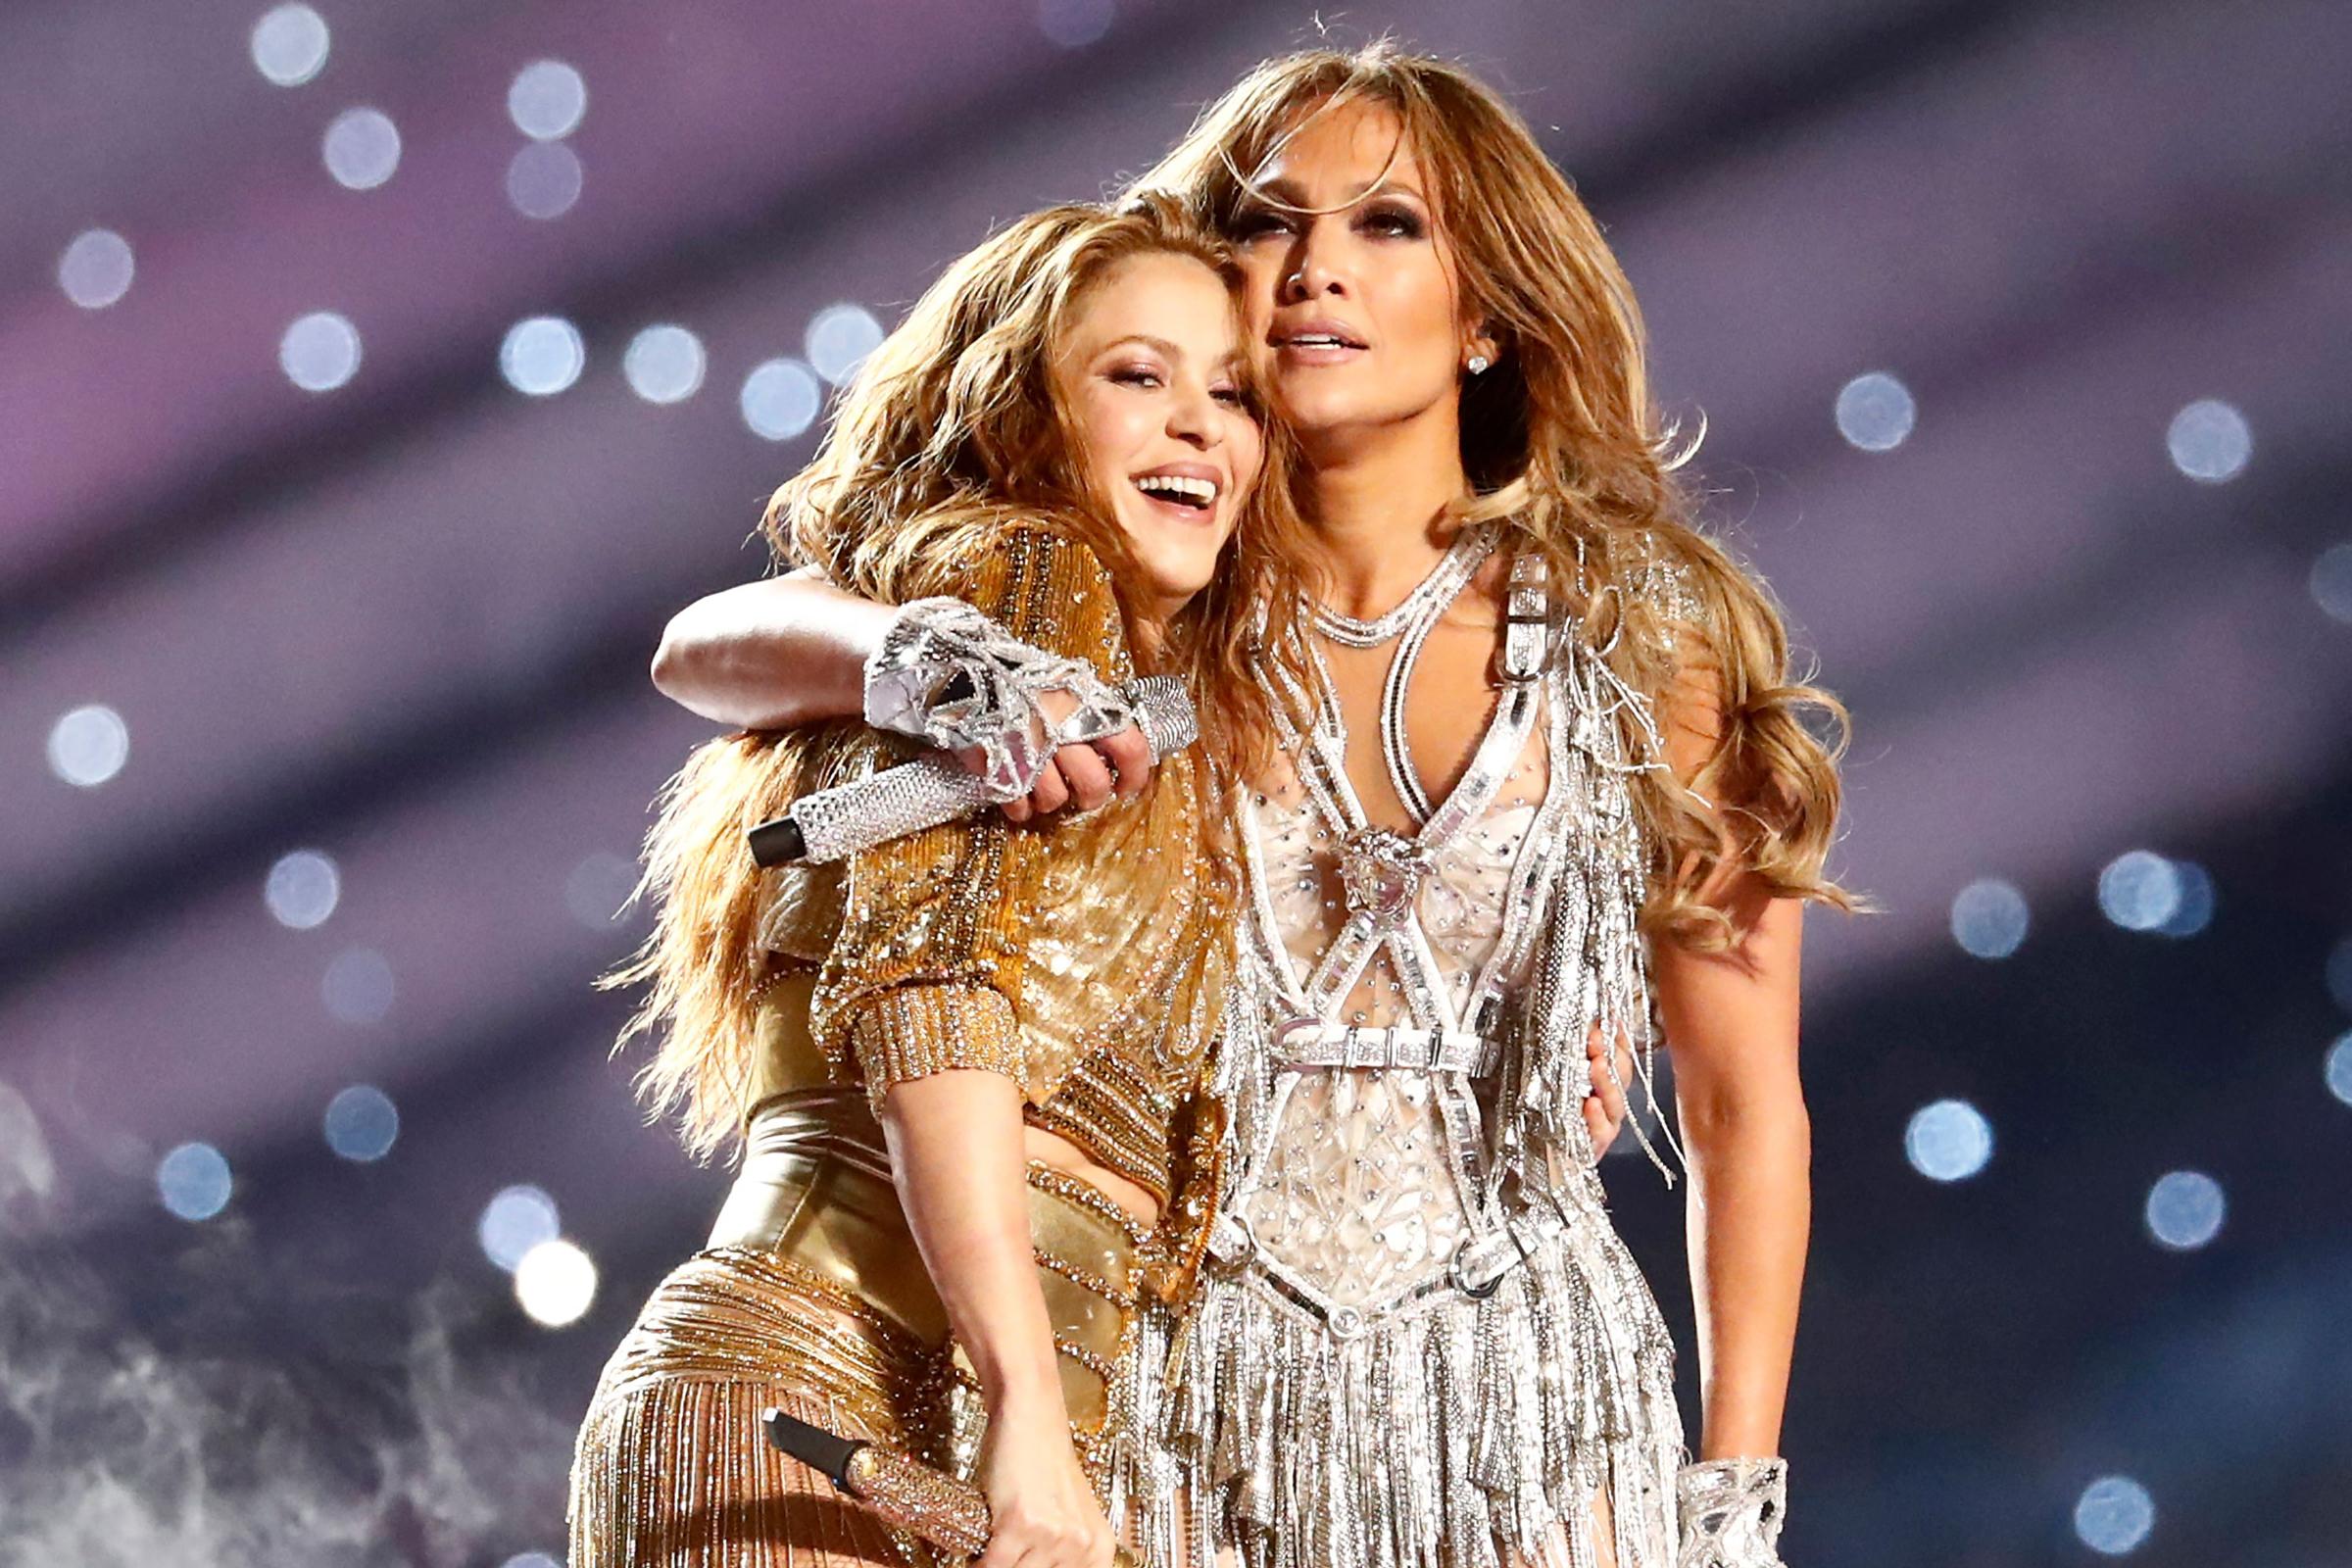 Jennifer Lopez Shakira Get Loud At Super Bowl 2020 Halftime Show Rolling Stone